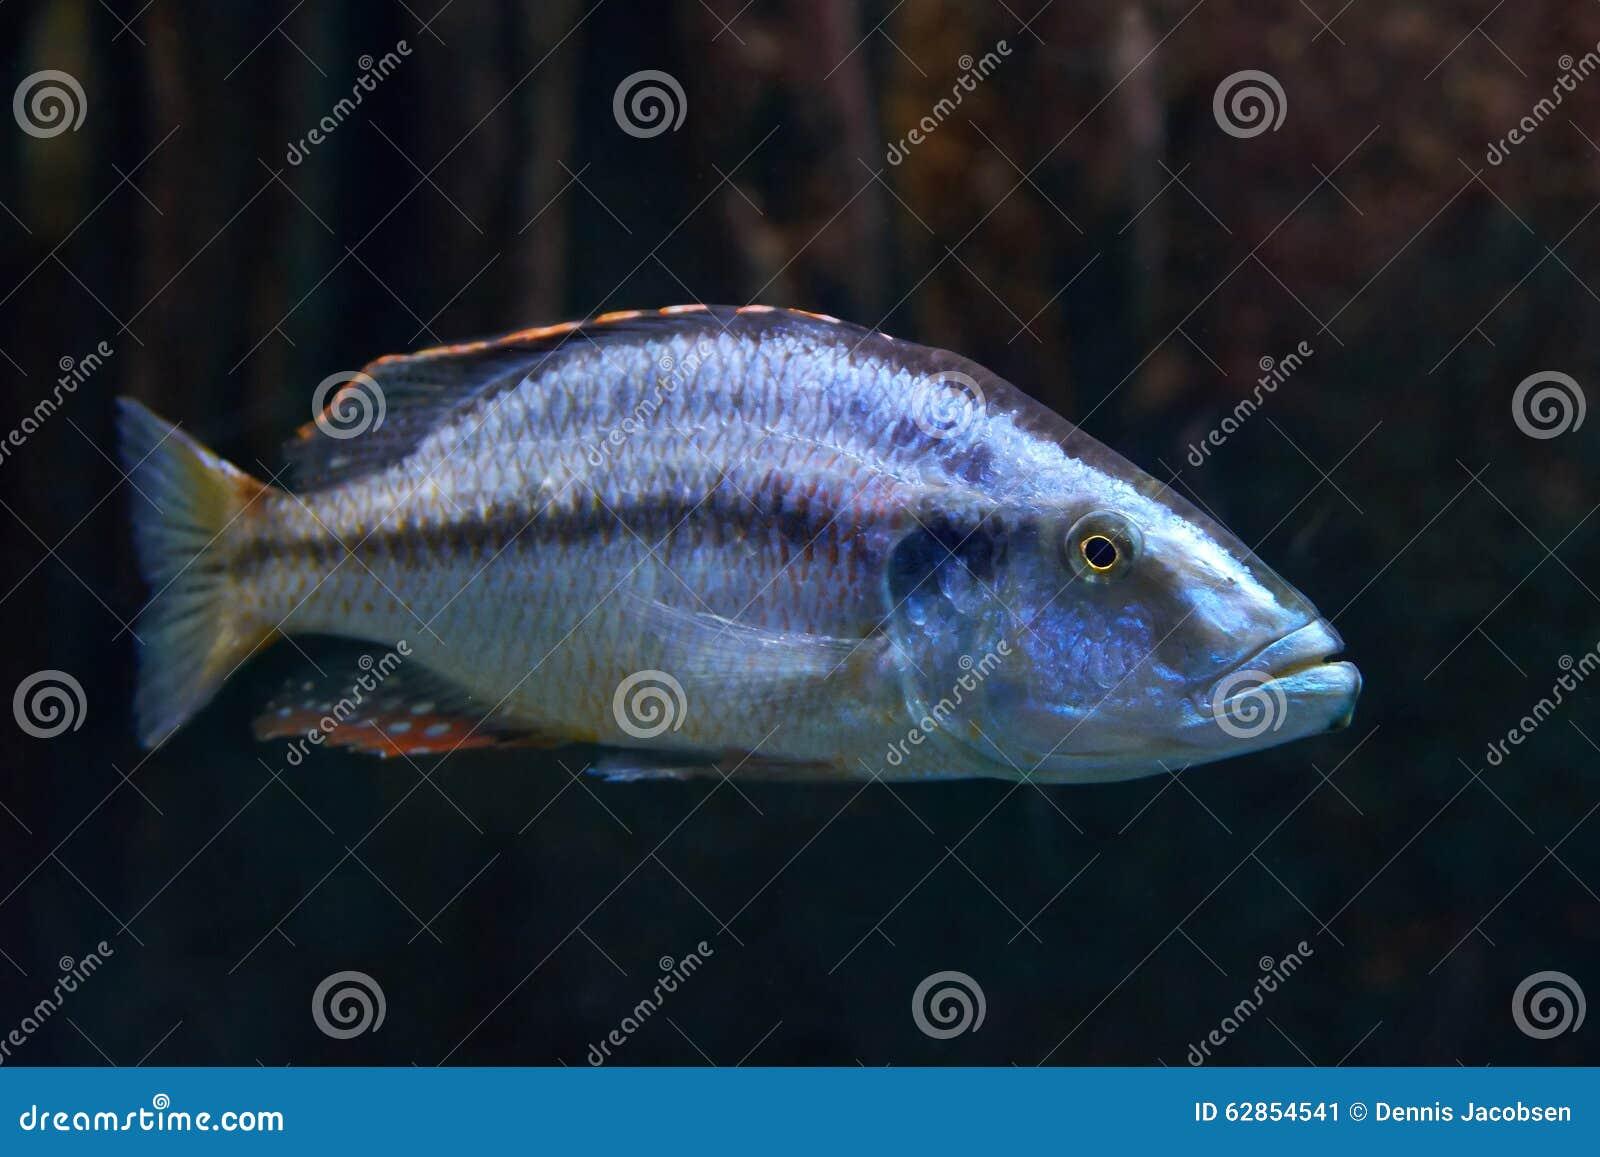 Malawi Eyebiter (Dimidiochromis Compressiceps) Stock Photo - Image ...